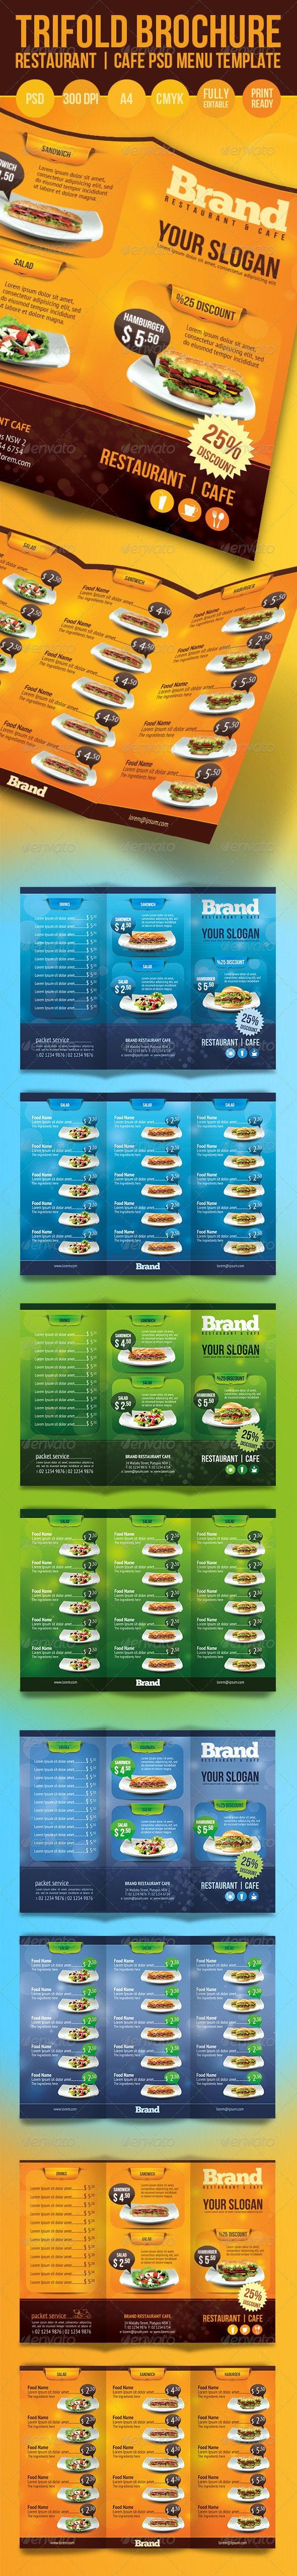 Trifold Brochure Restaurant Cafe Menu PSD Template - Food Menus Print Templates